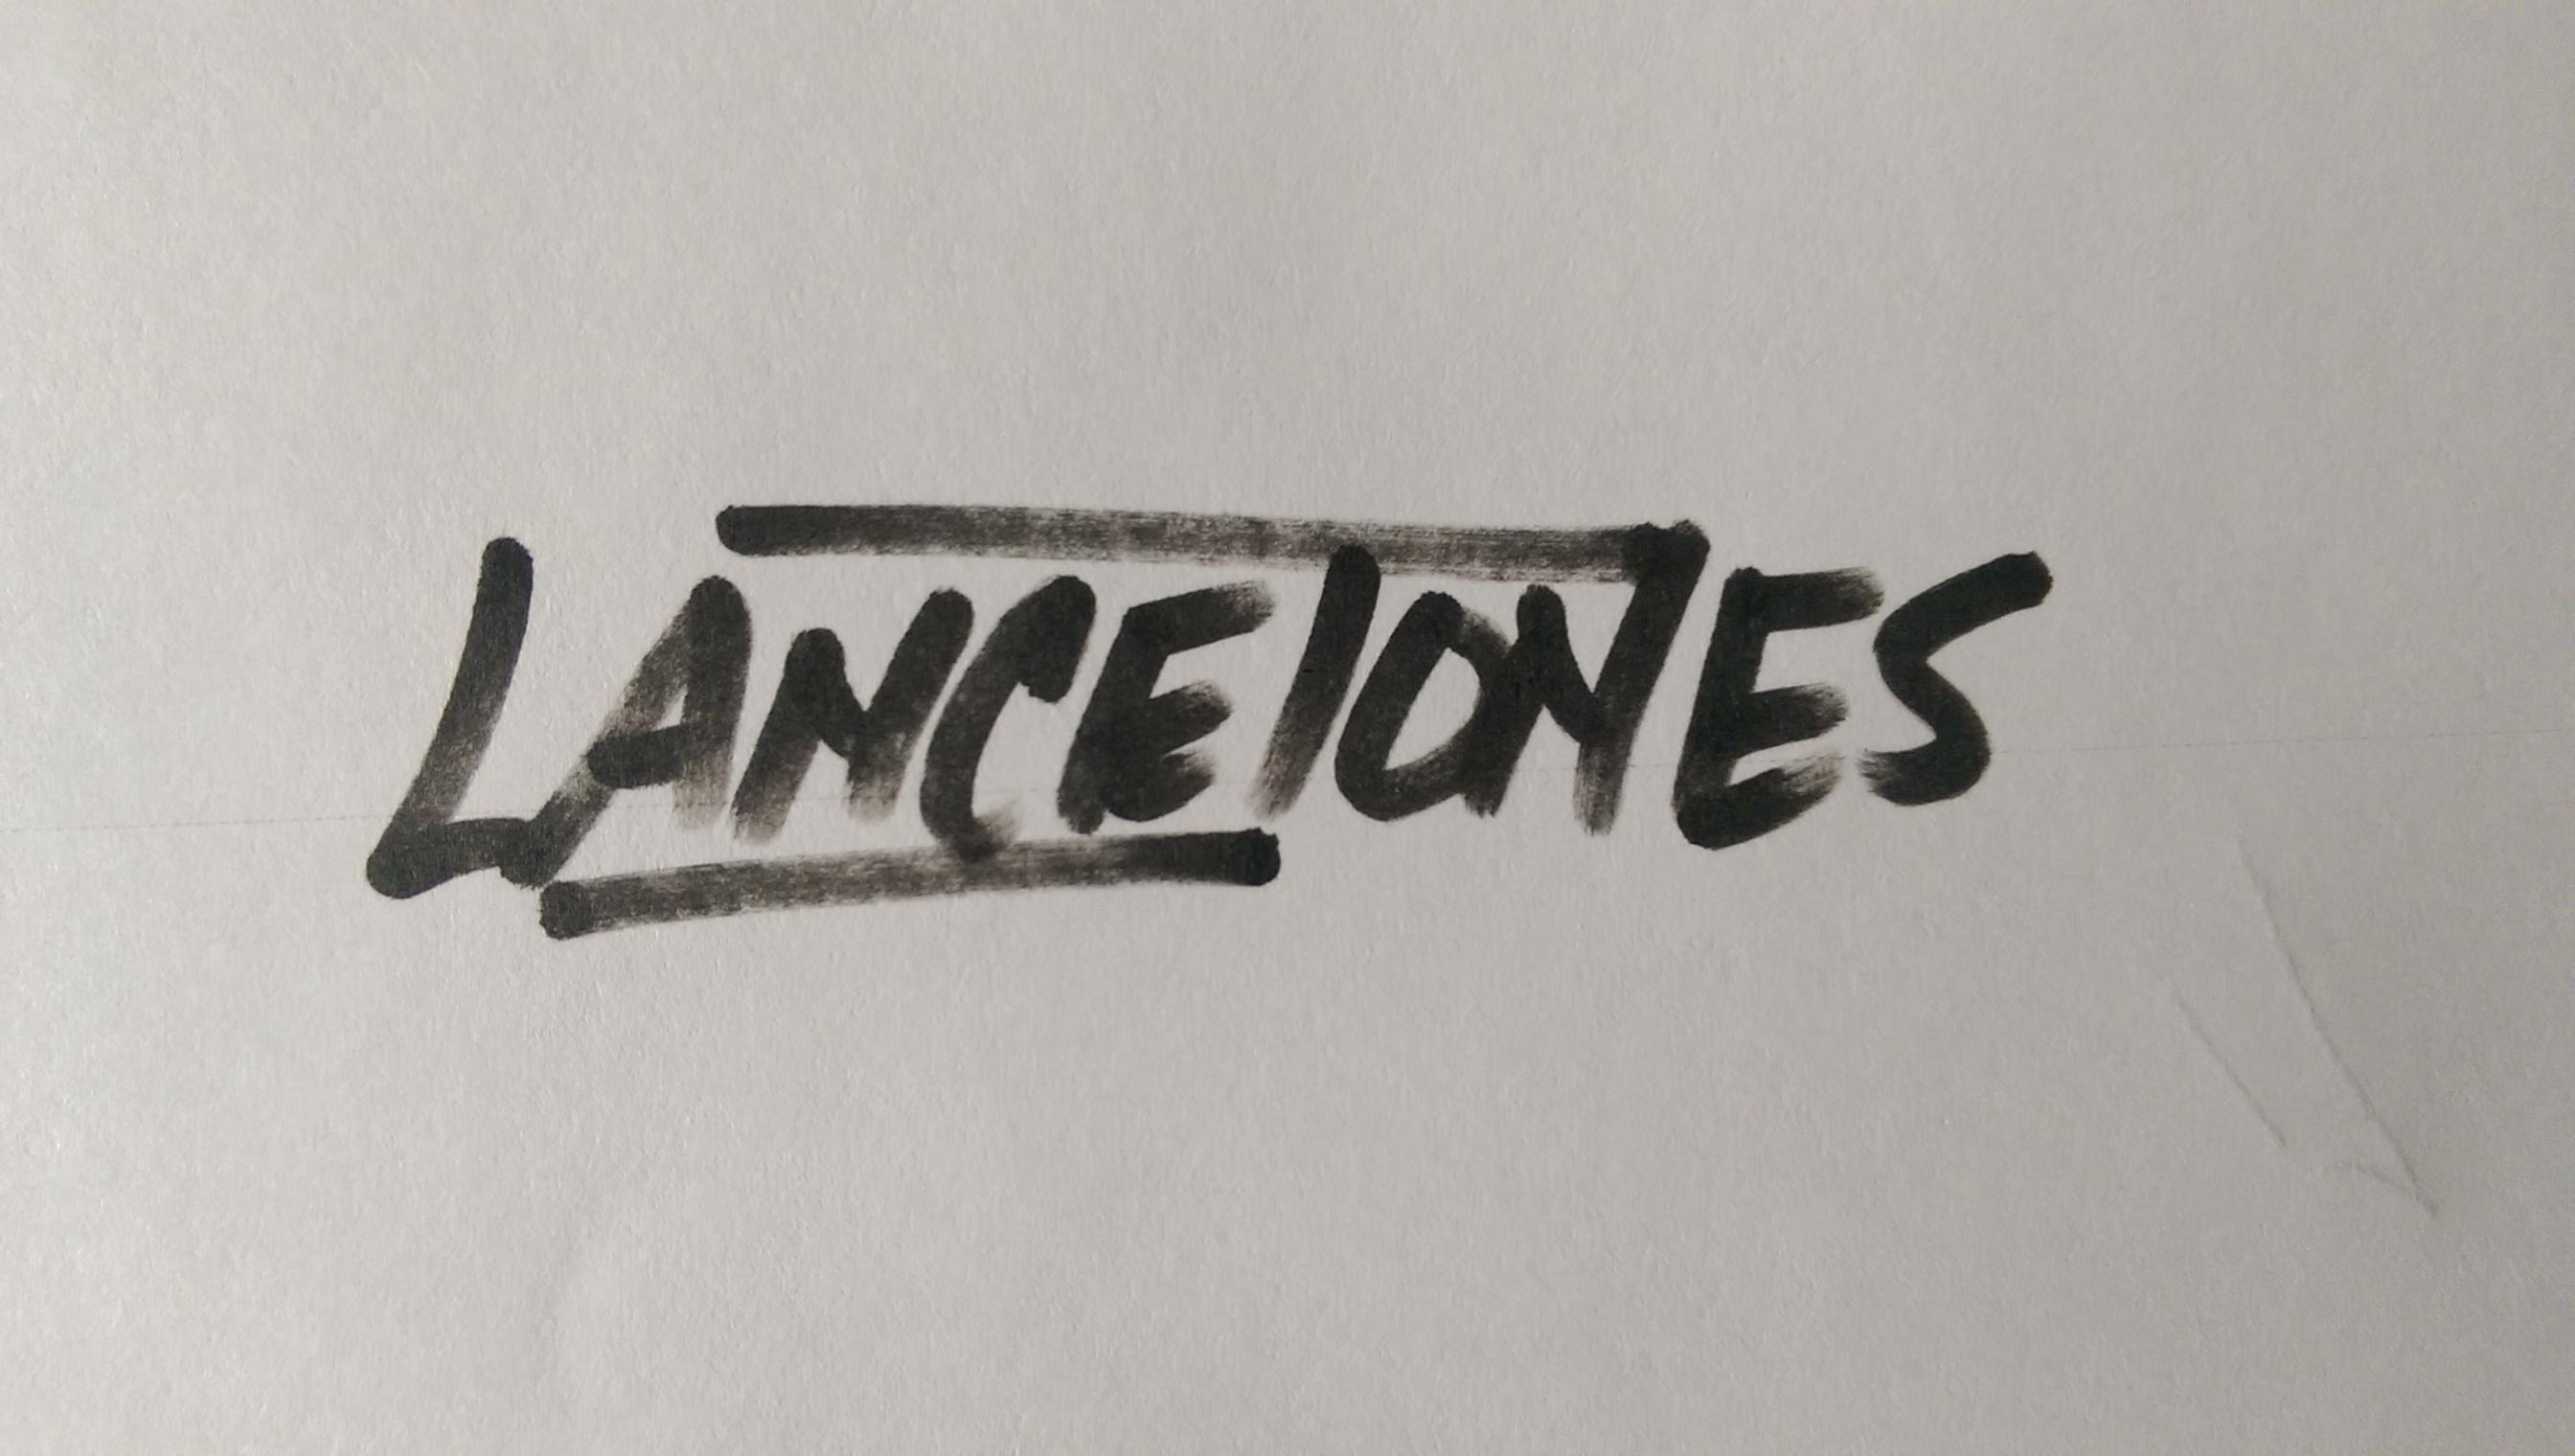 Lance Jones Signature